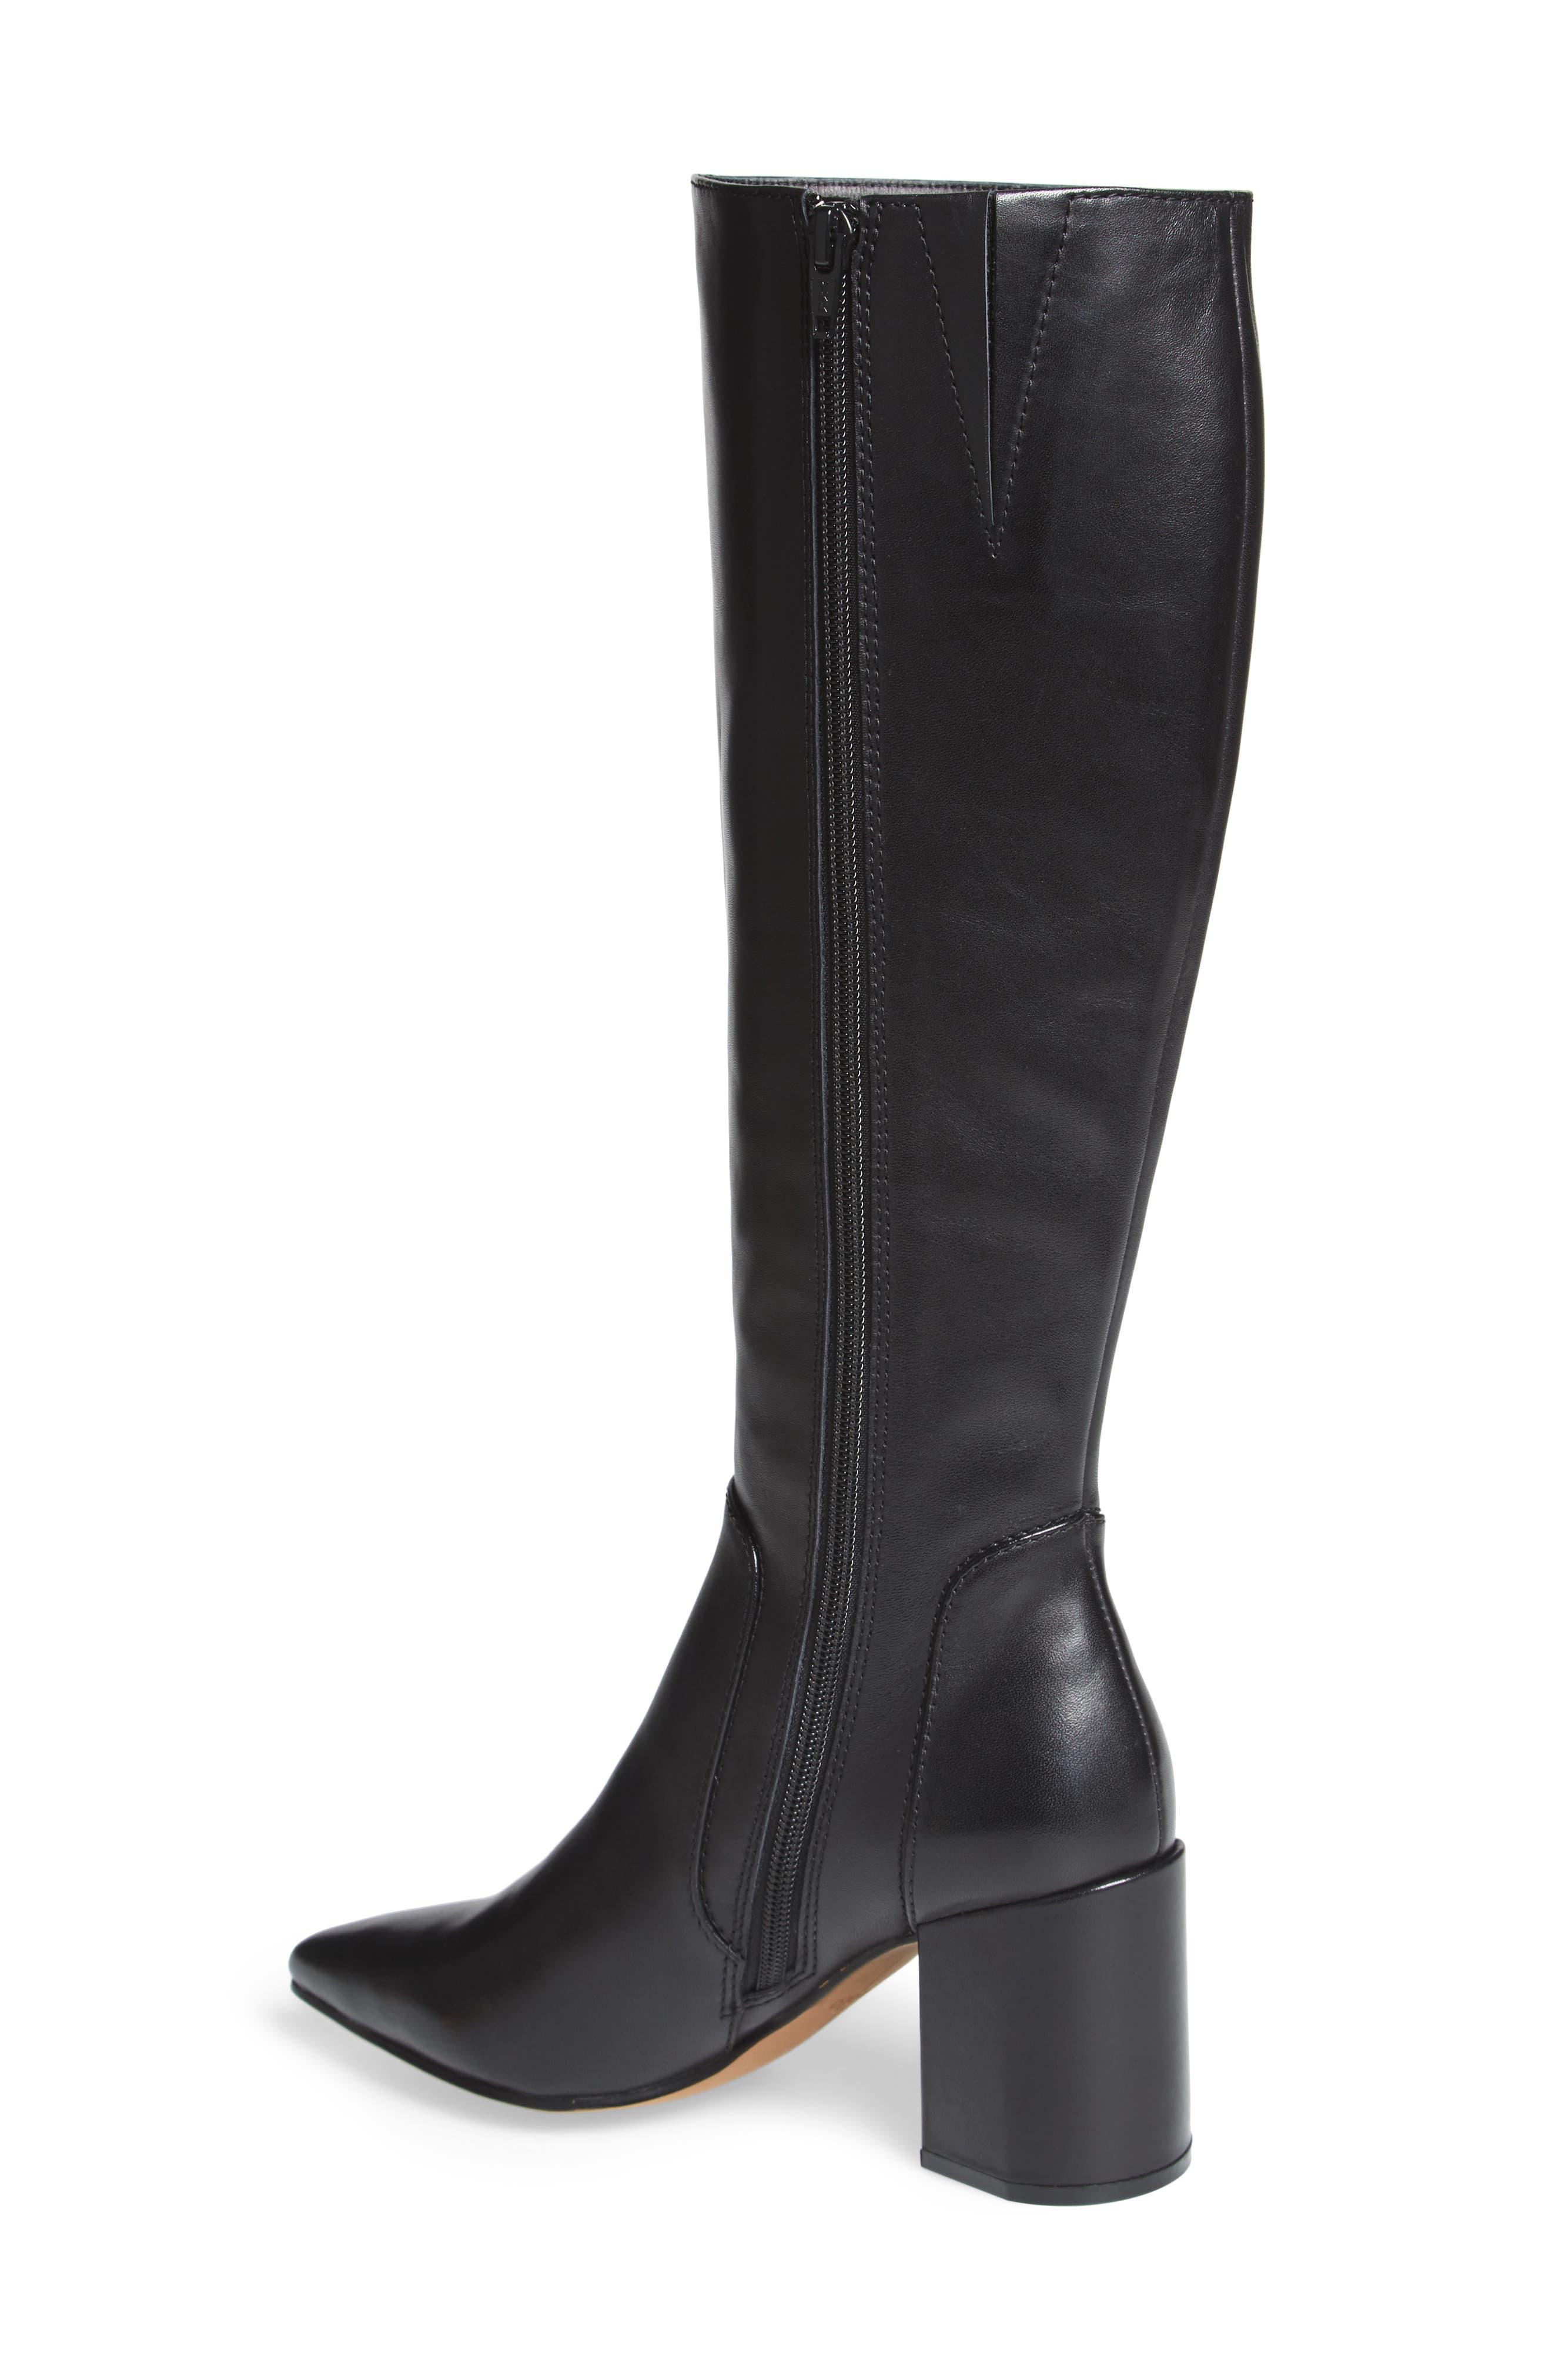 Blink Boot,                             Alternate thumbnail 2, color,                             Black Leather